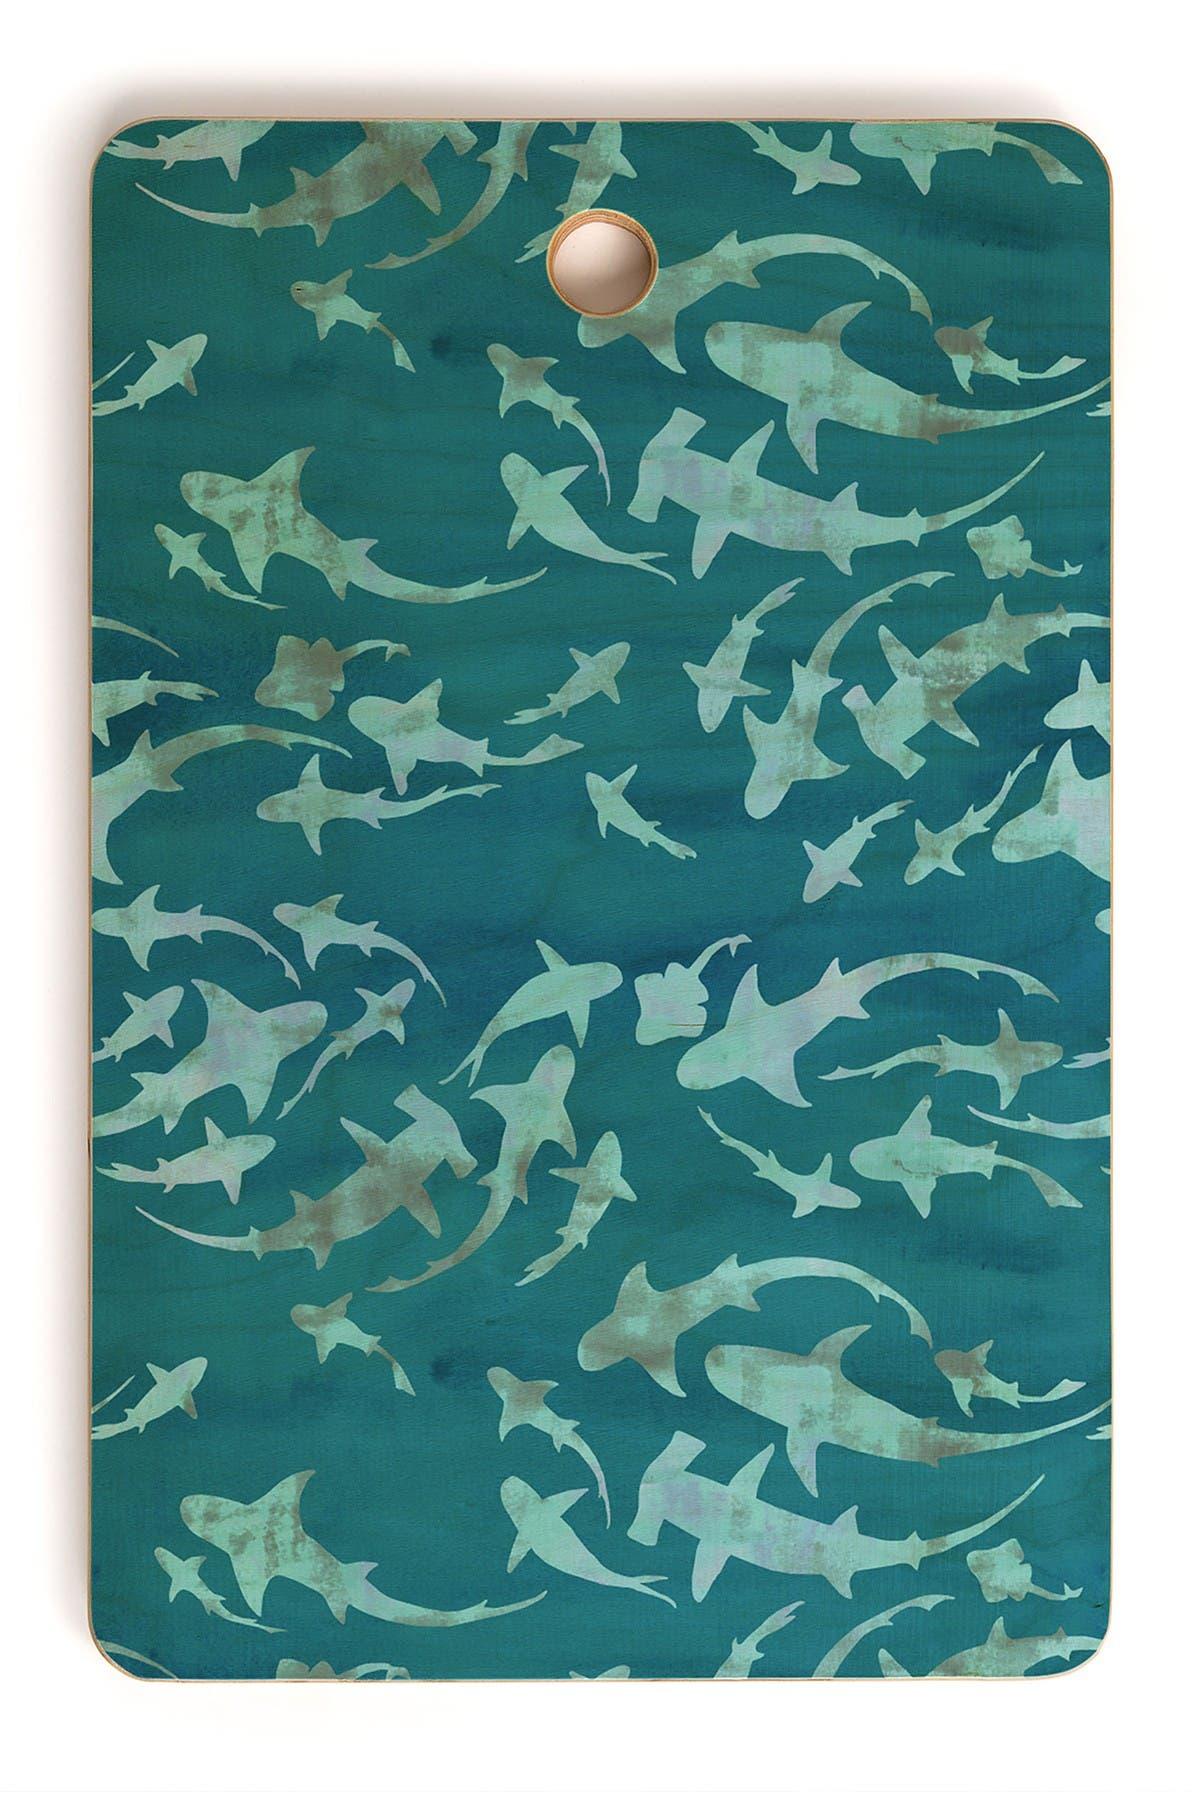 Image of Deny Designs Schatzi Brown Sharky Aqua Rectangle Cutting Board